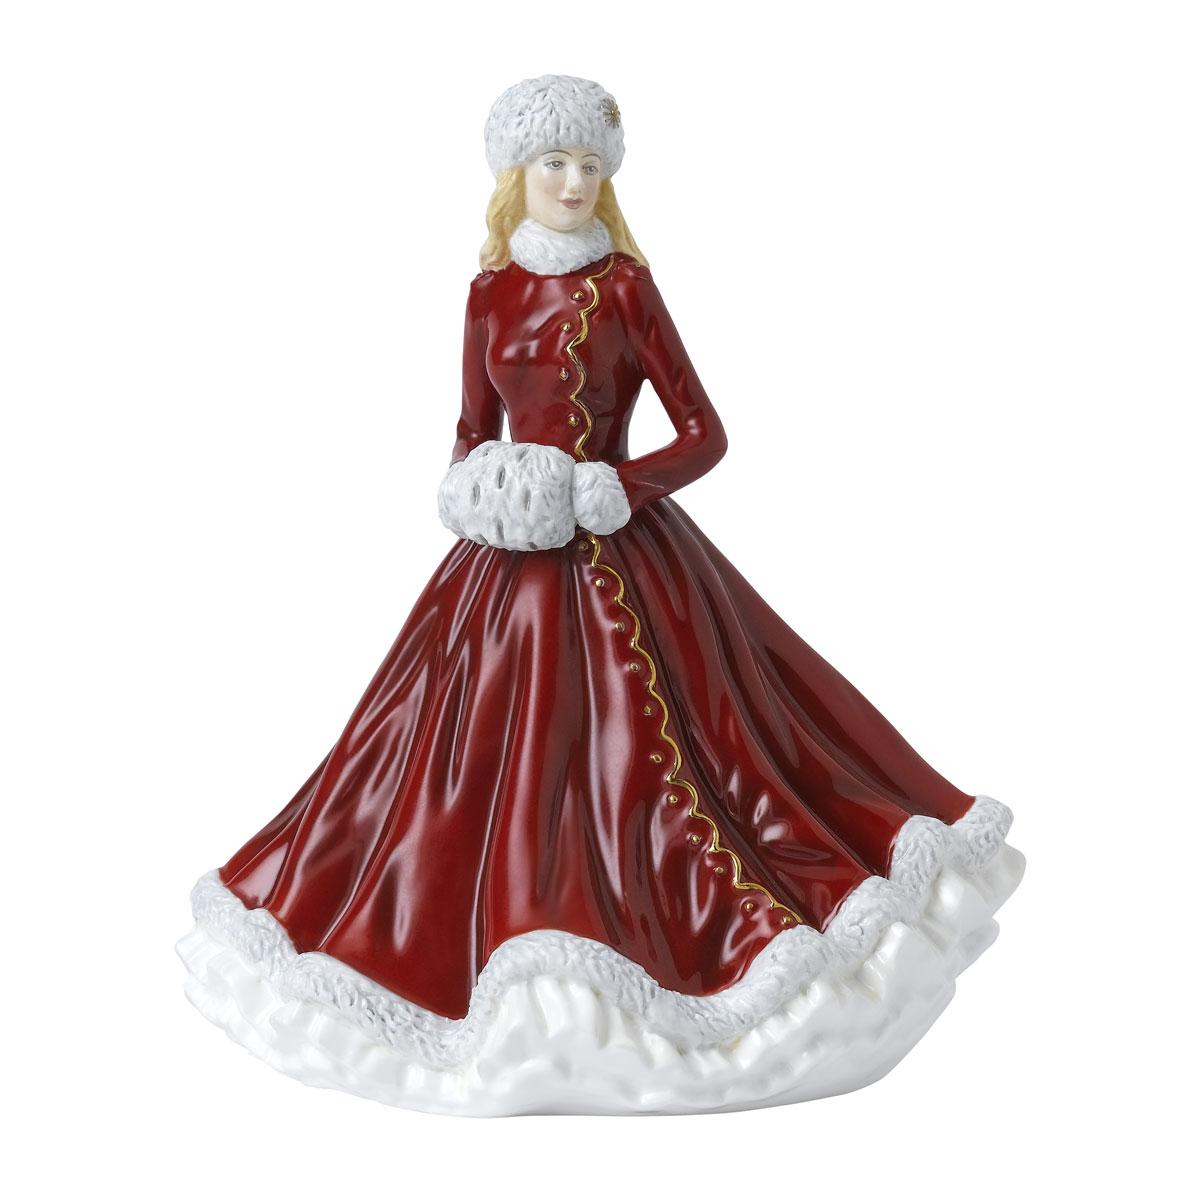 Royal Doulton Christmas Cheer Pettite Of The Year 2021